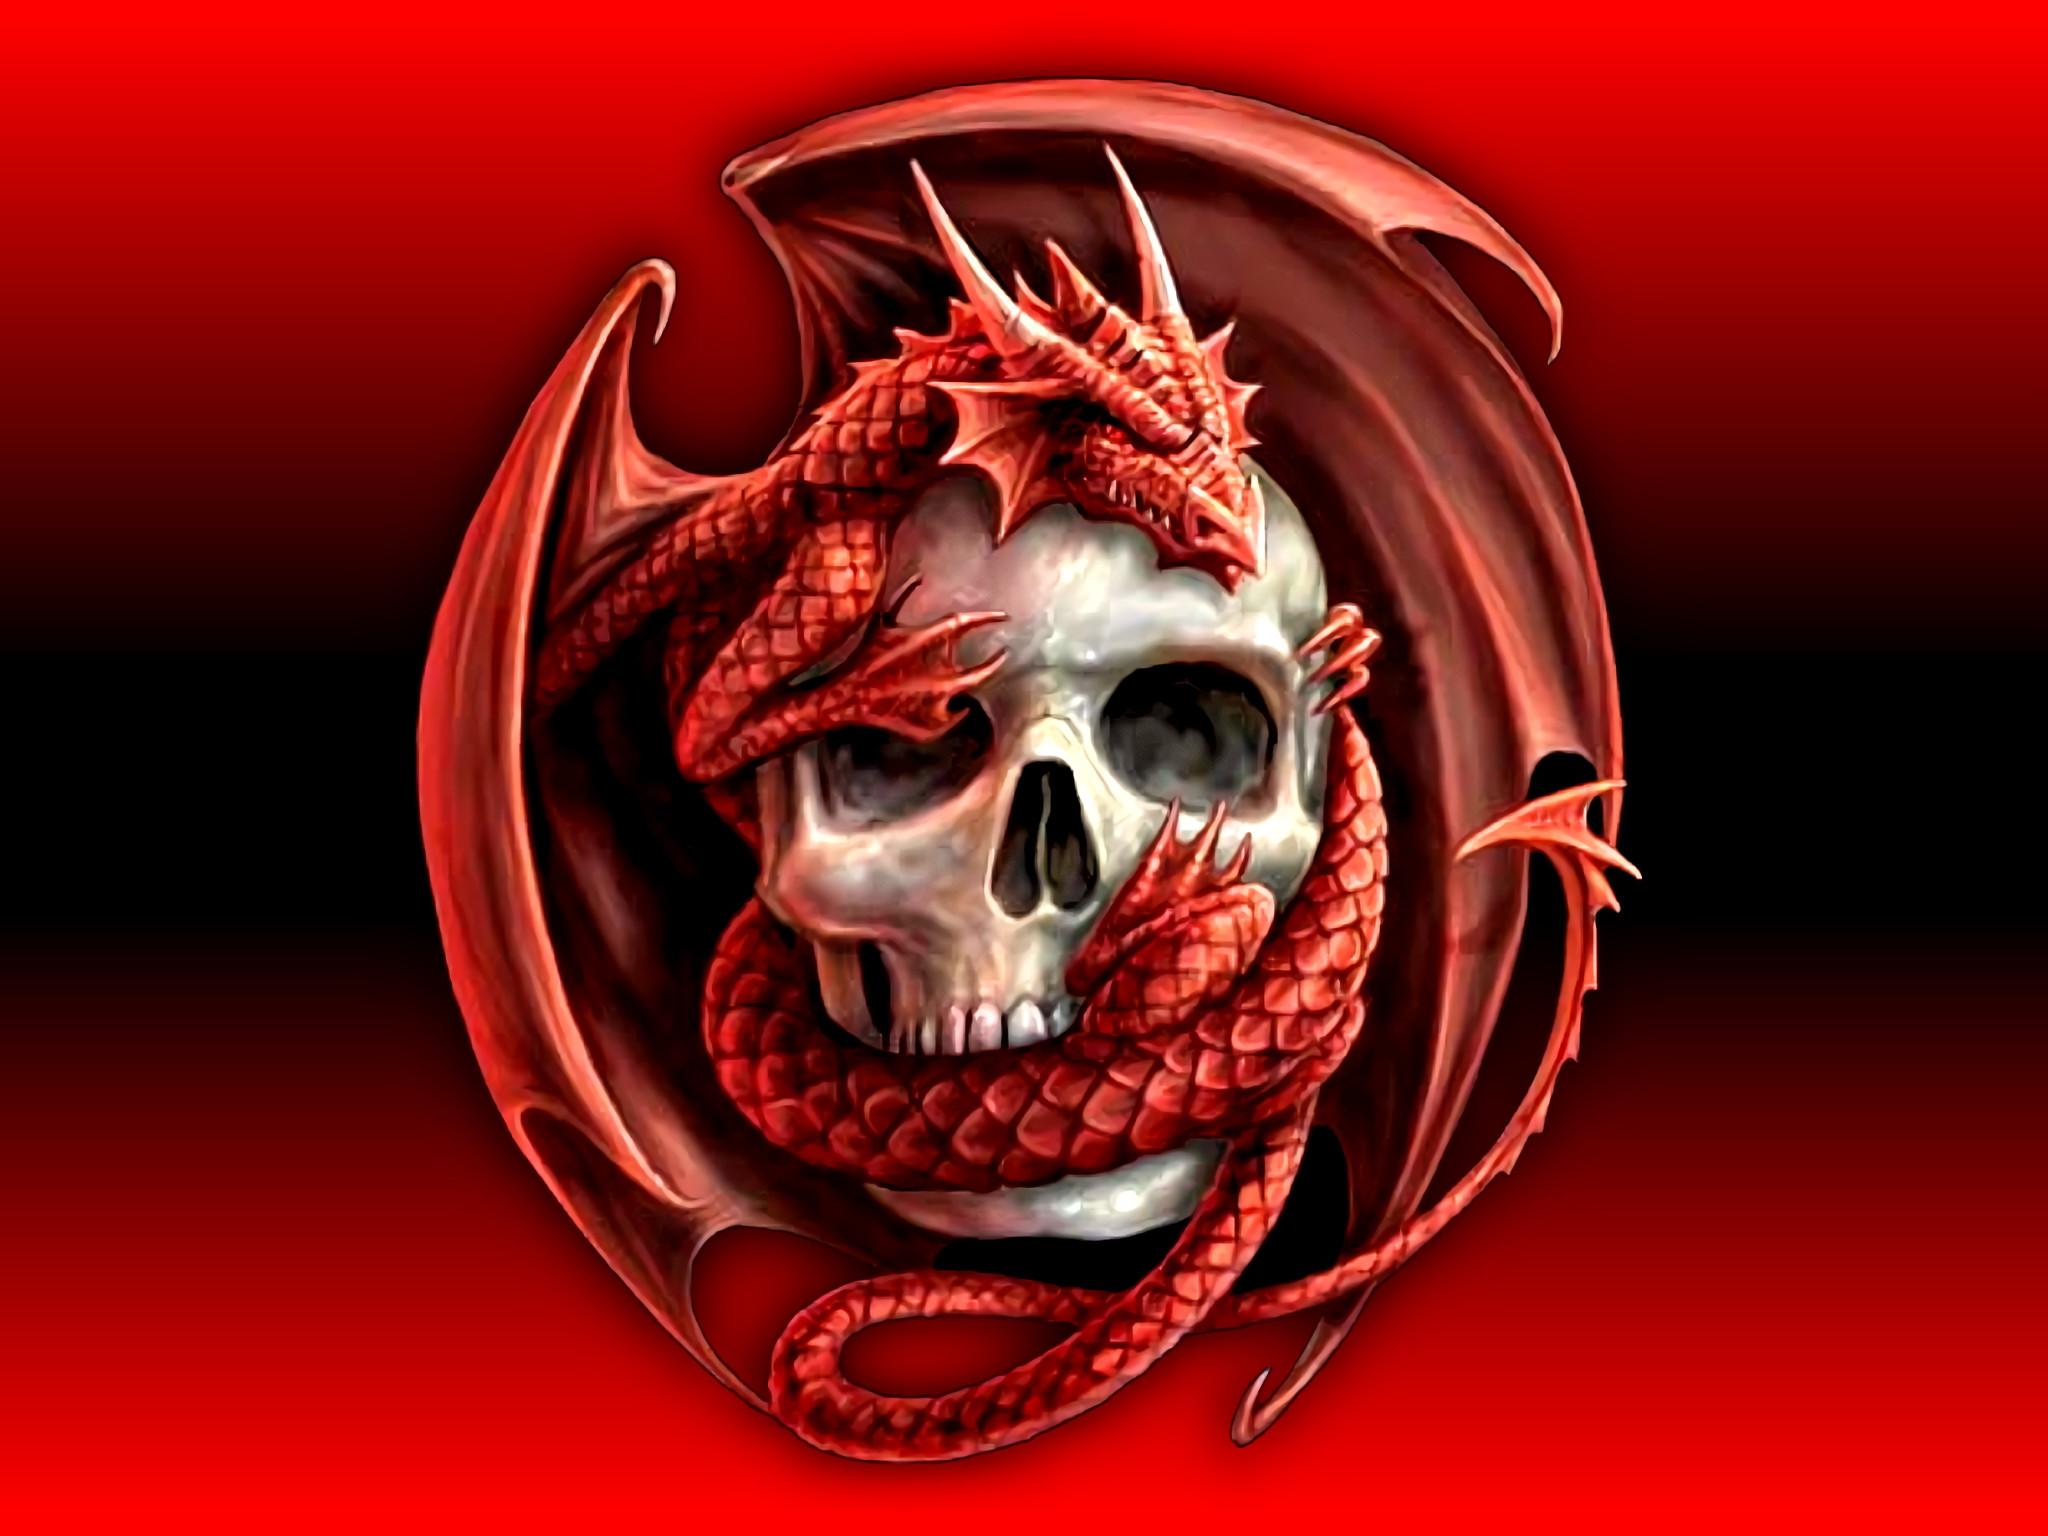 Res: 2048x1536, HD Wallpaper | Background Image ID:27403.  Dark Skull